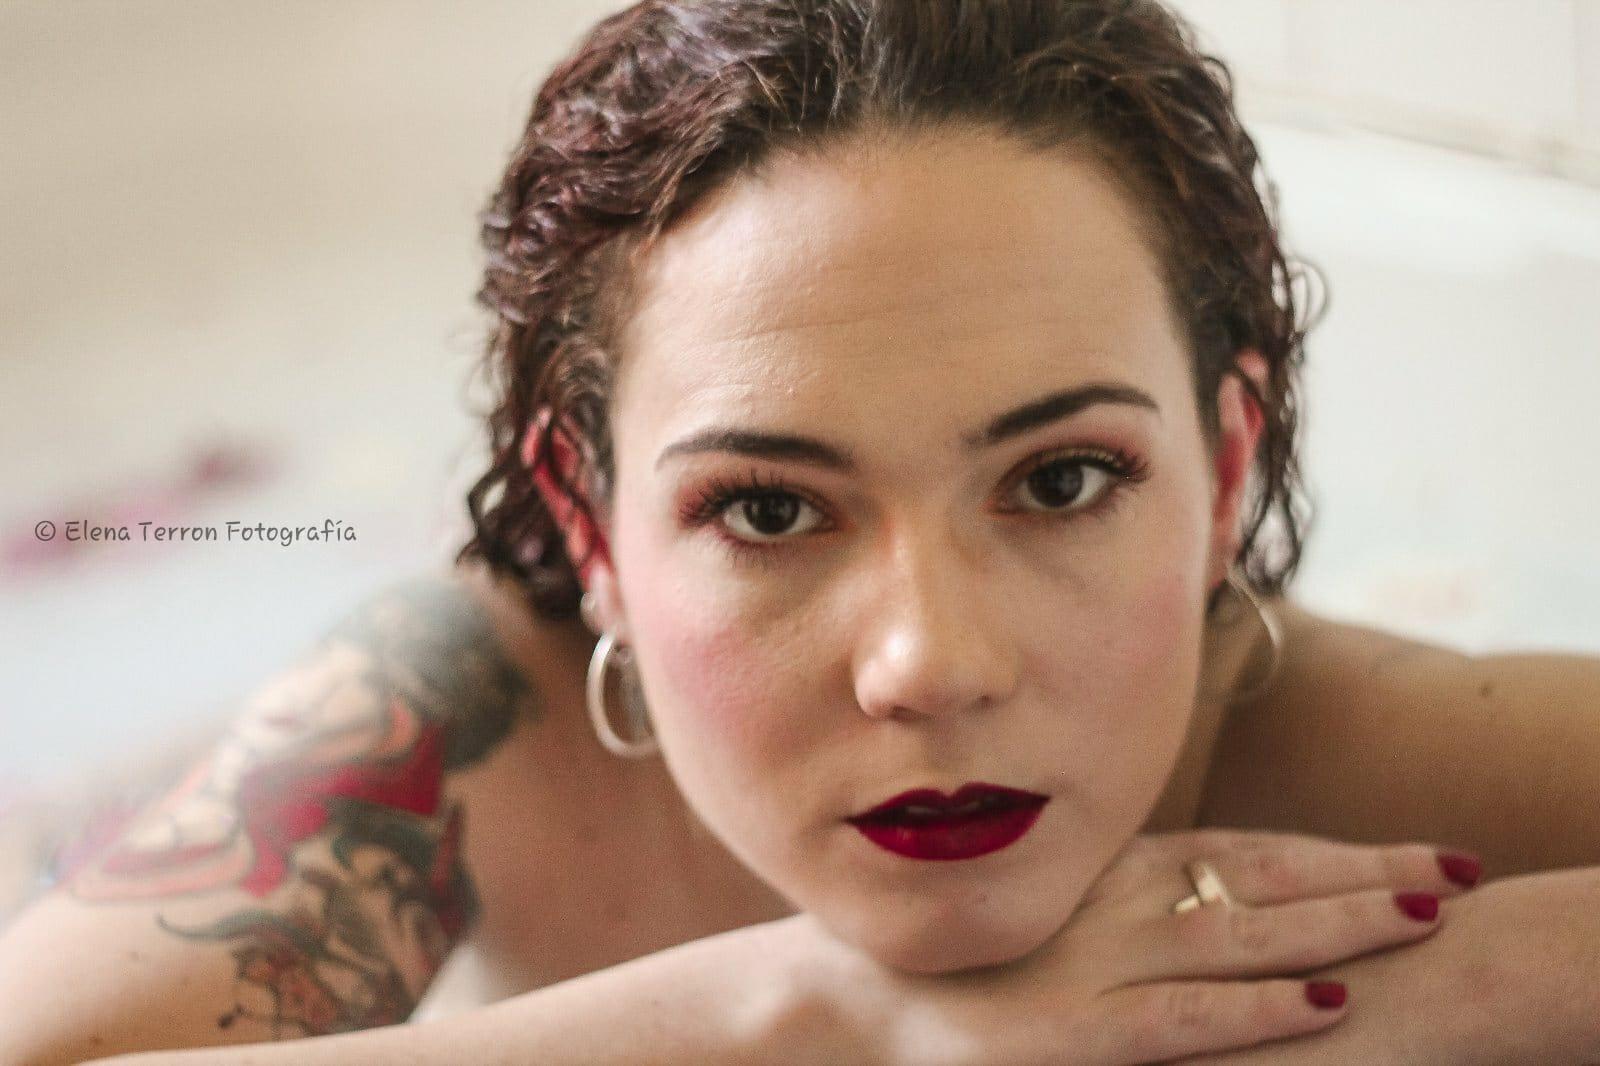 Hermosa joven en la bañera